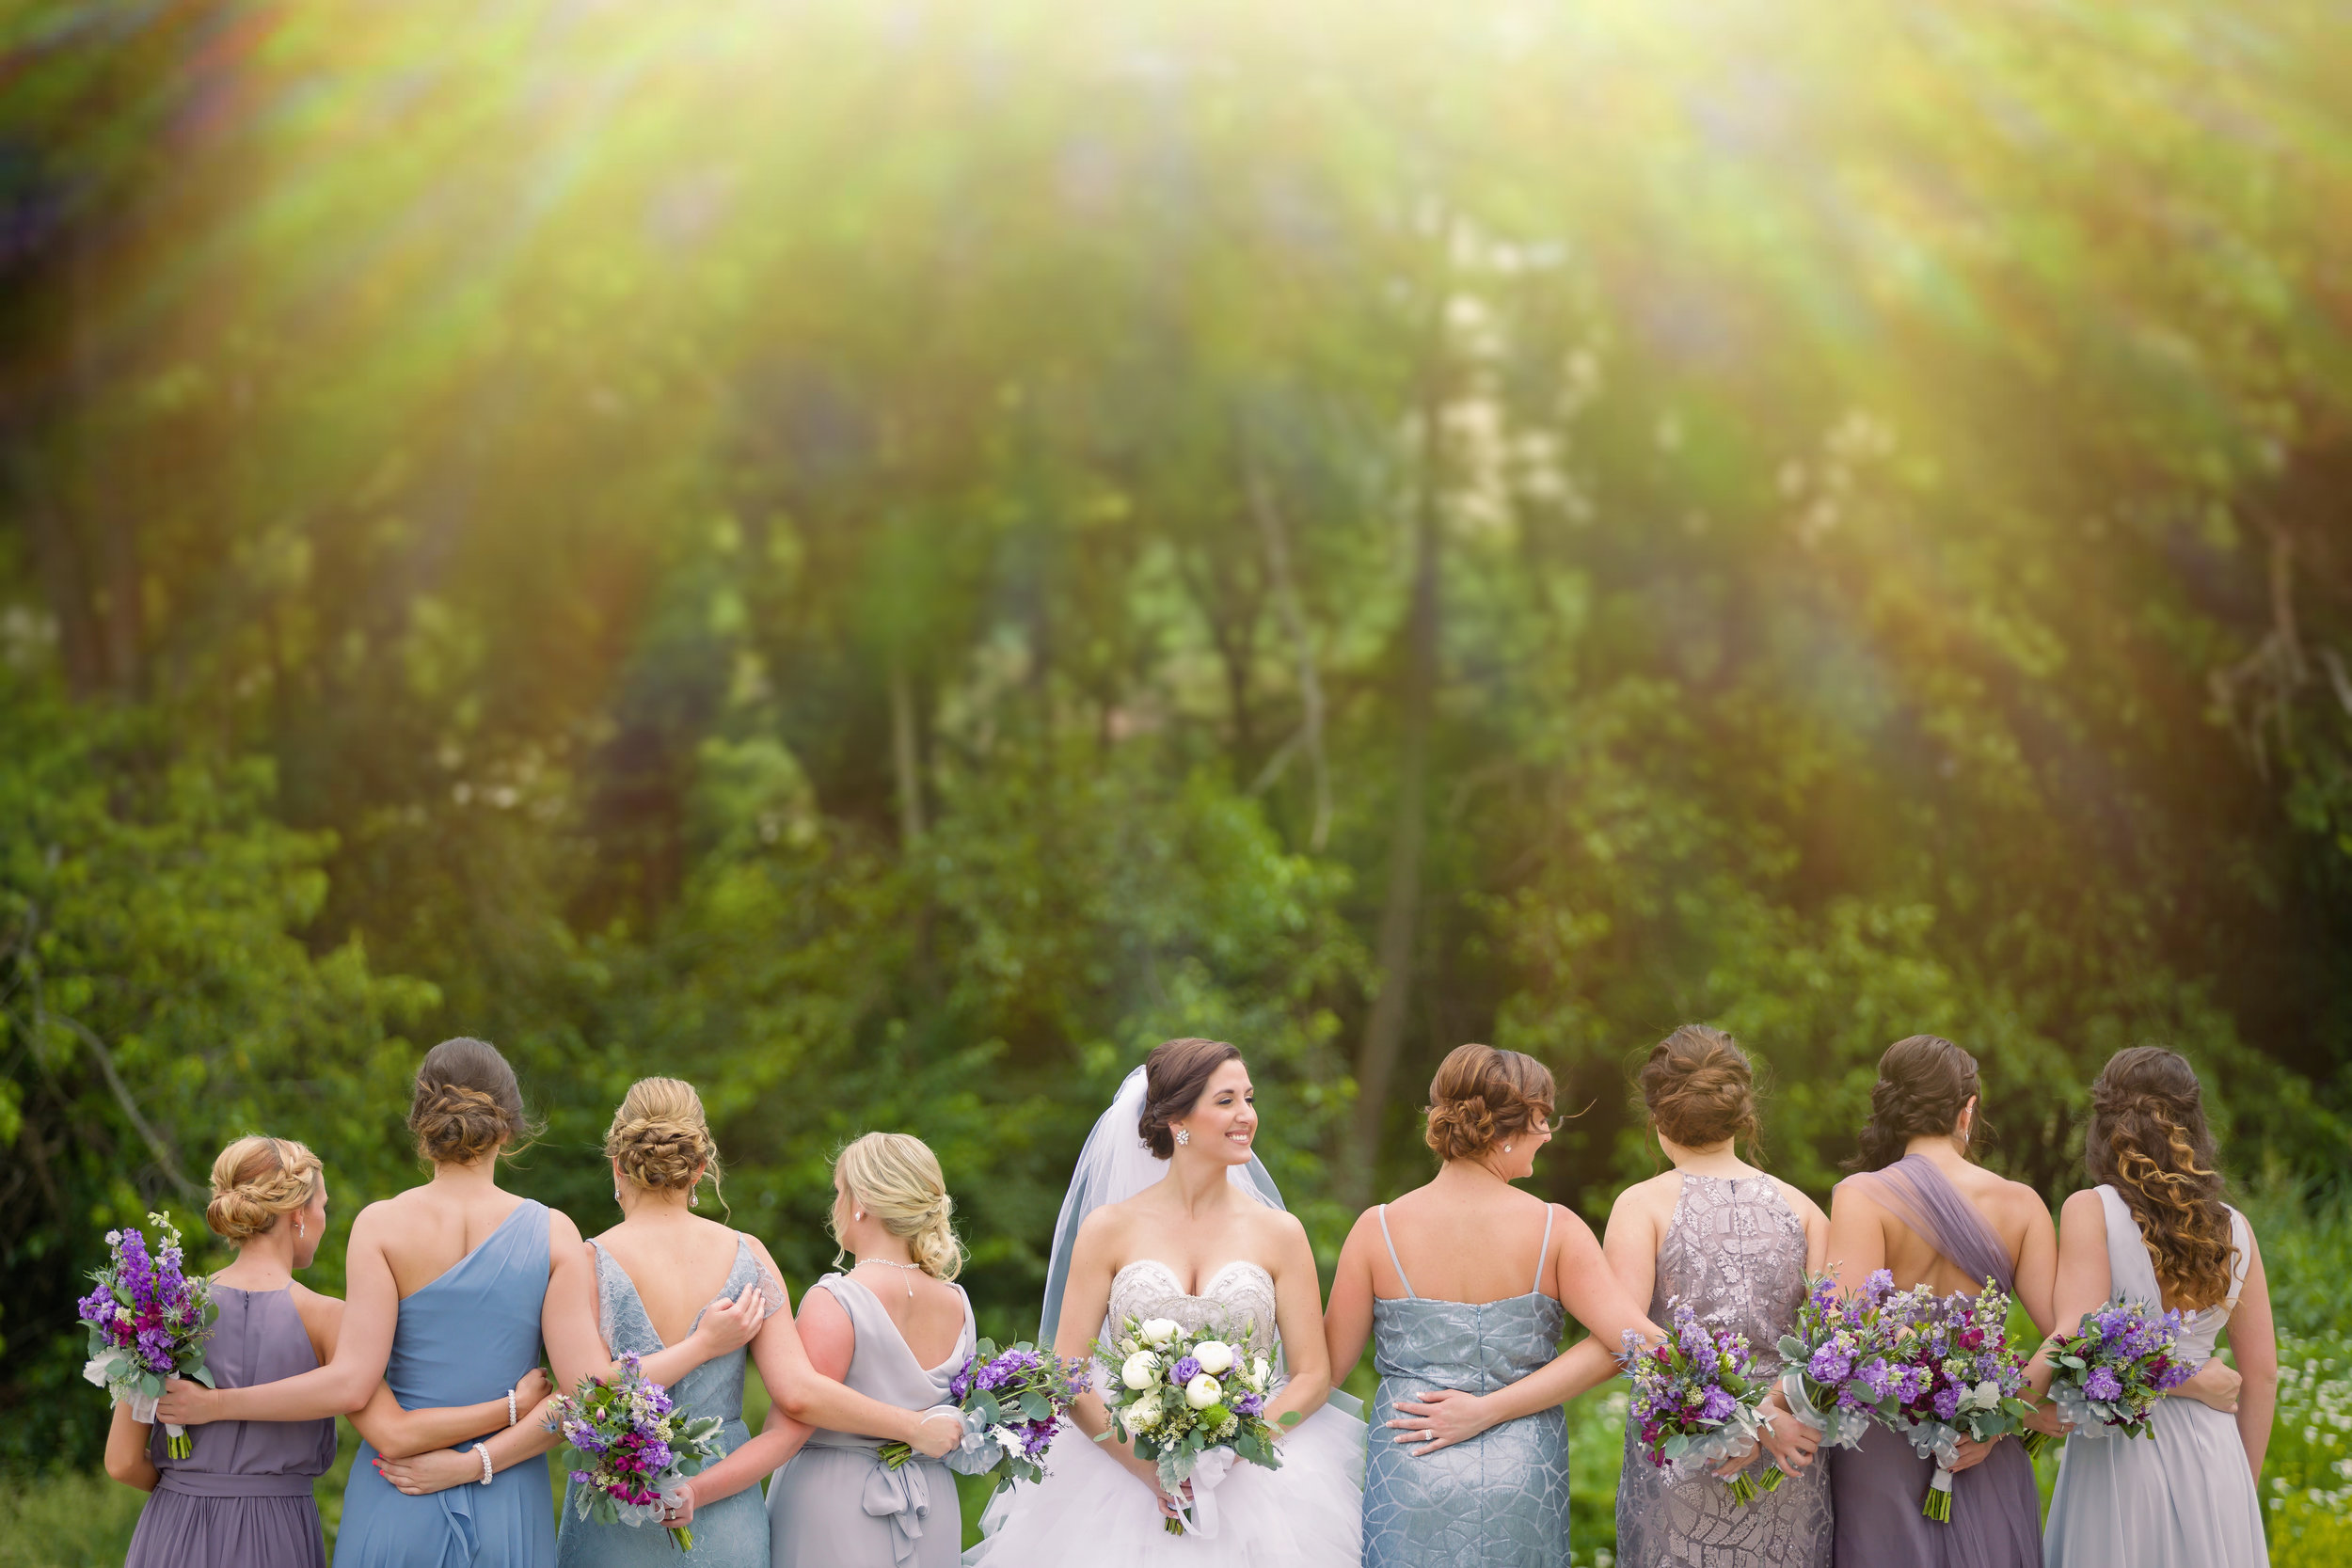 Blue Bridesmaid Dresses - Pittsburgh Wedding Venue - Duquesne University Wedding